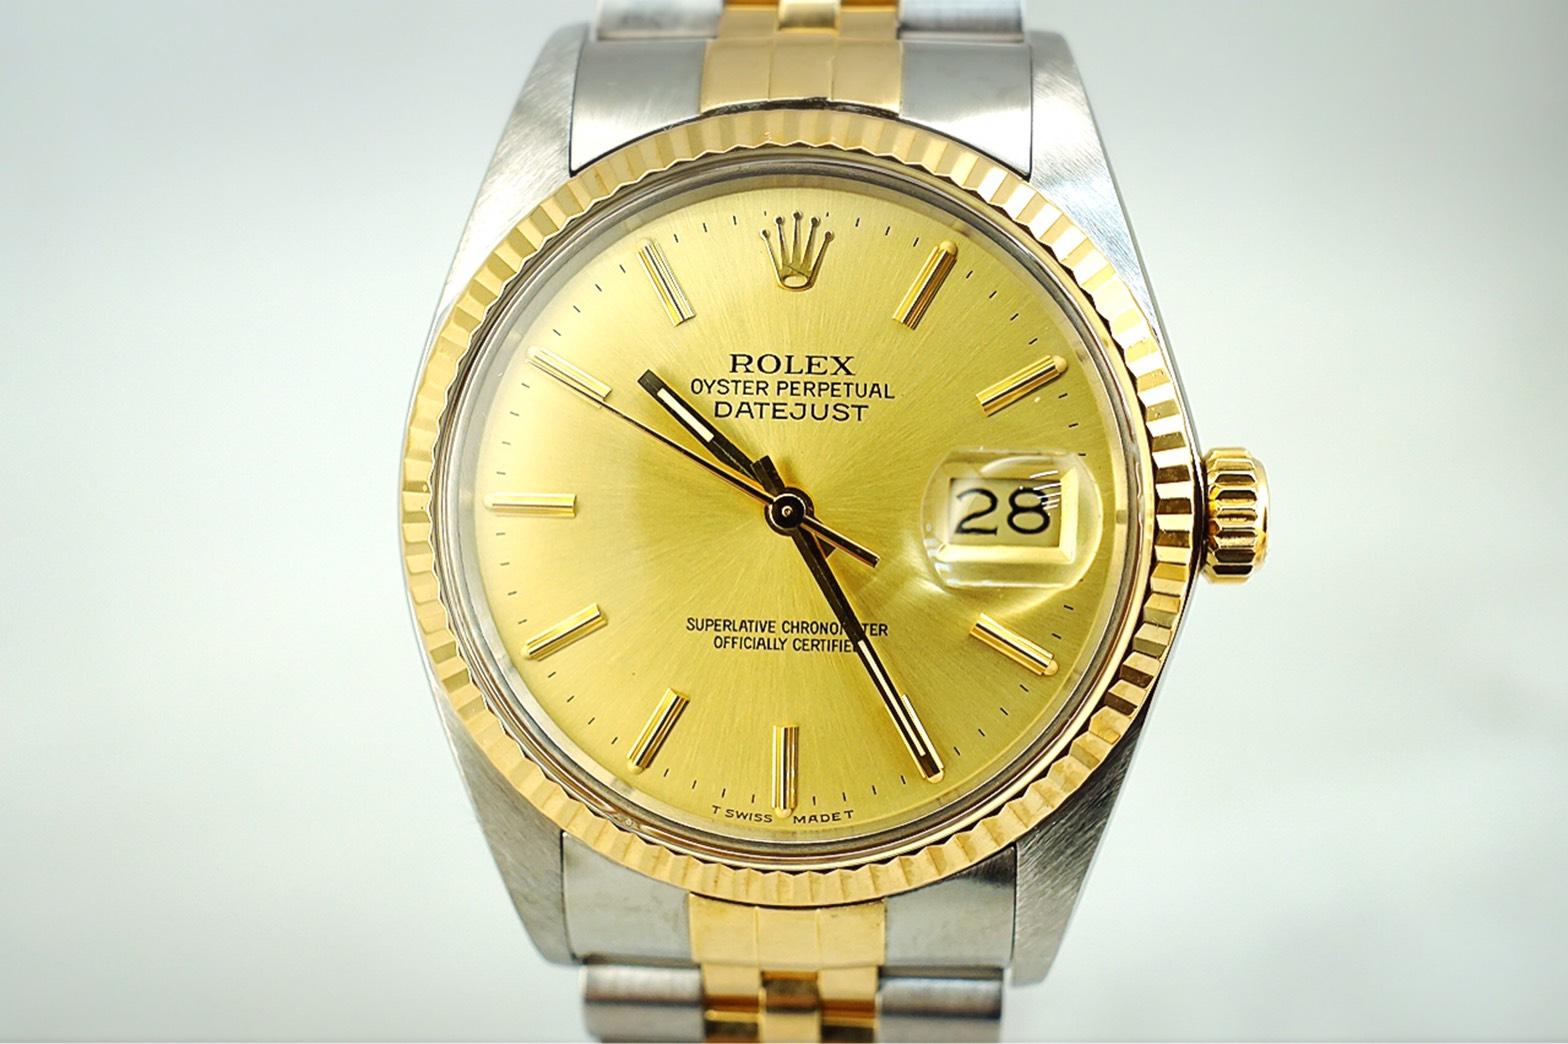 ROLEX デイトジャスト 16013 4